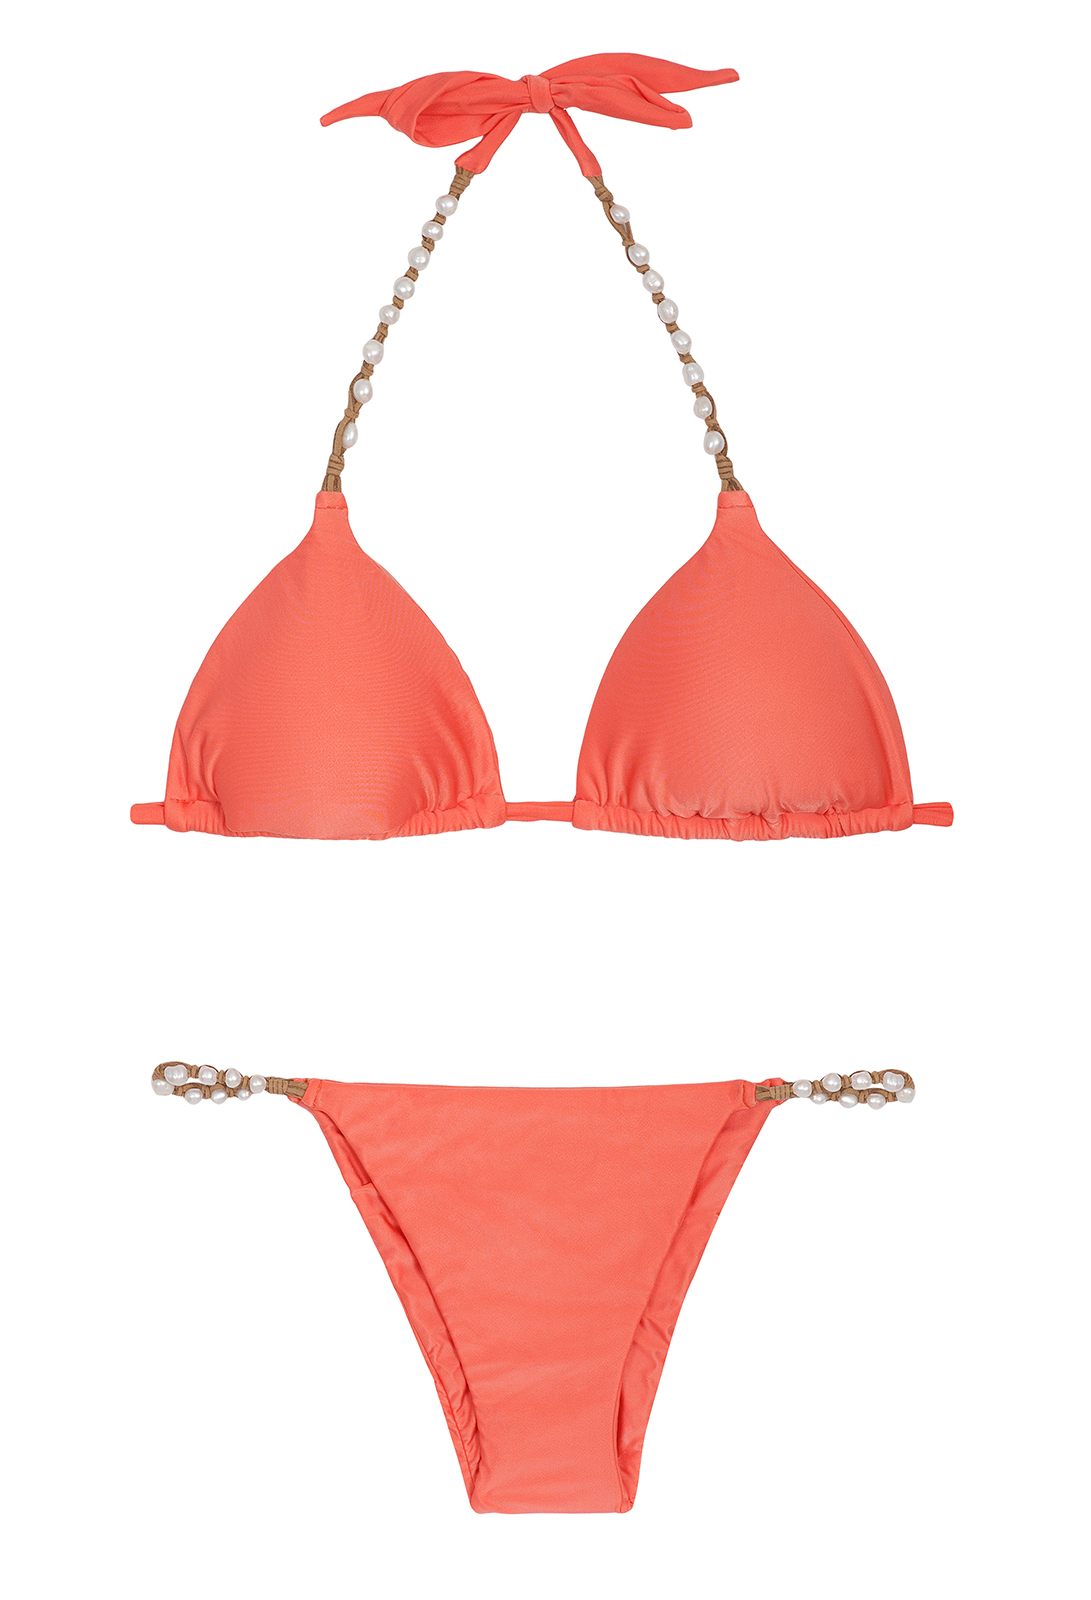 despi maillot de bain triangle orange avec perles coral new shelly. Black Bedroom Furniture Sets. Home Design Ideas